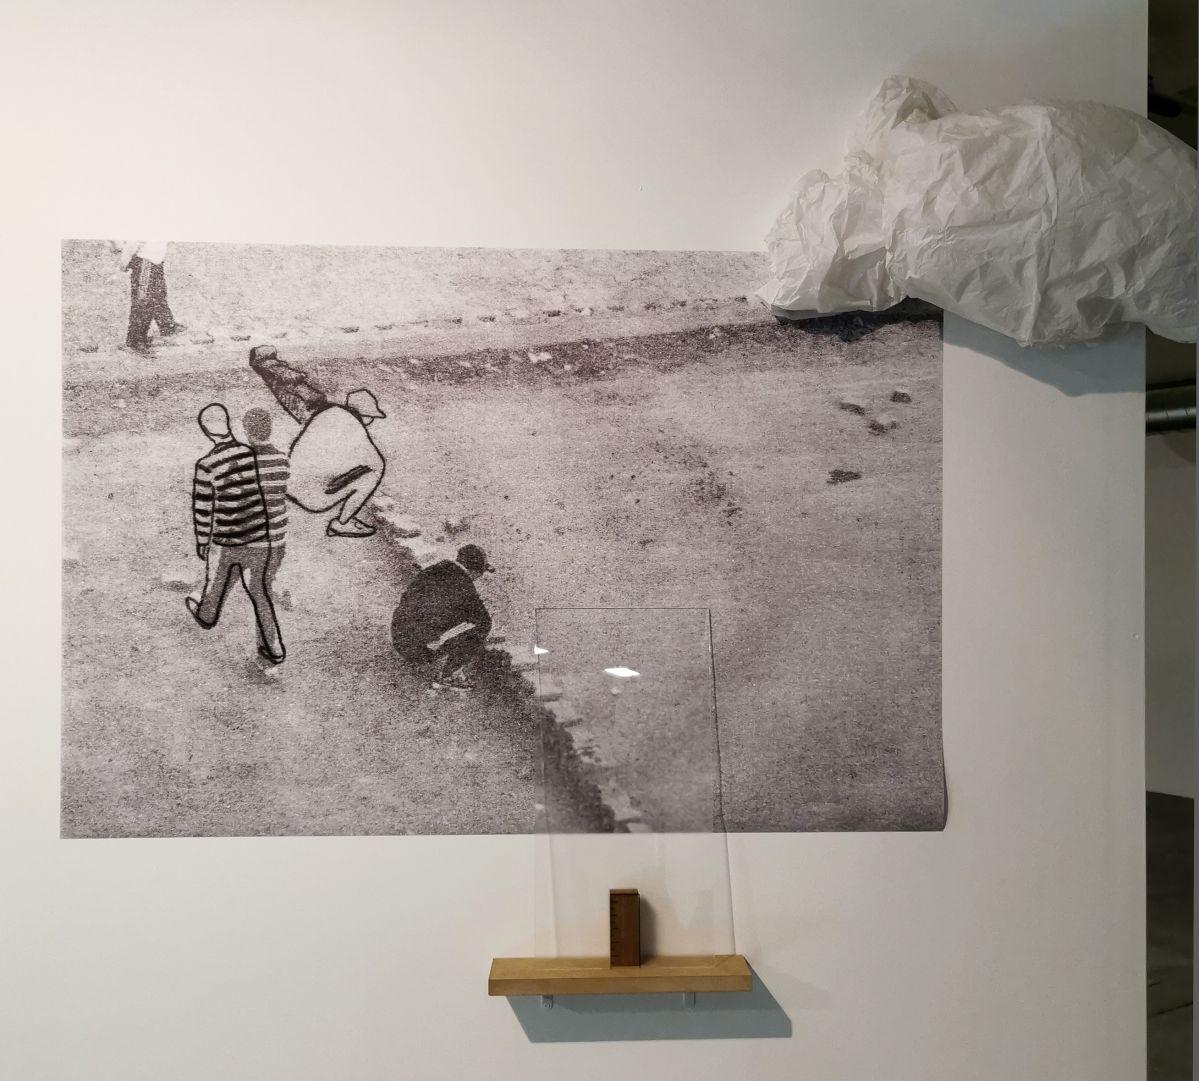 Massinissa Selmani, Unexpected Distances - Scenario #1, 2017 - 2020 - En attendant Omar Gatlato - Fiche la Belle de Mai - Marseille